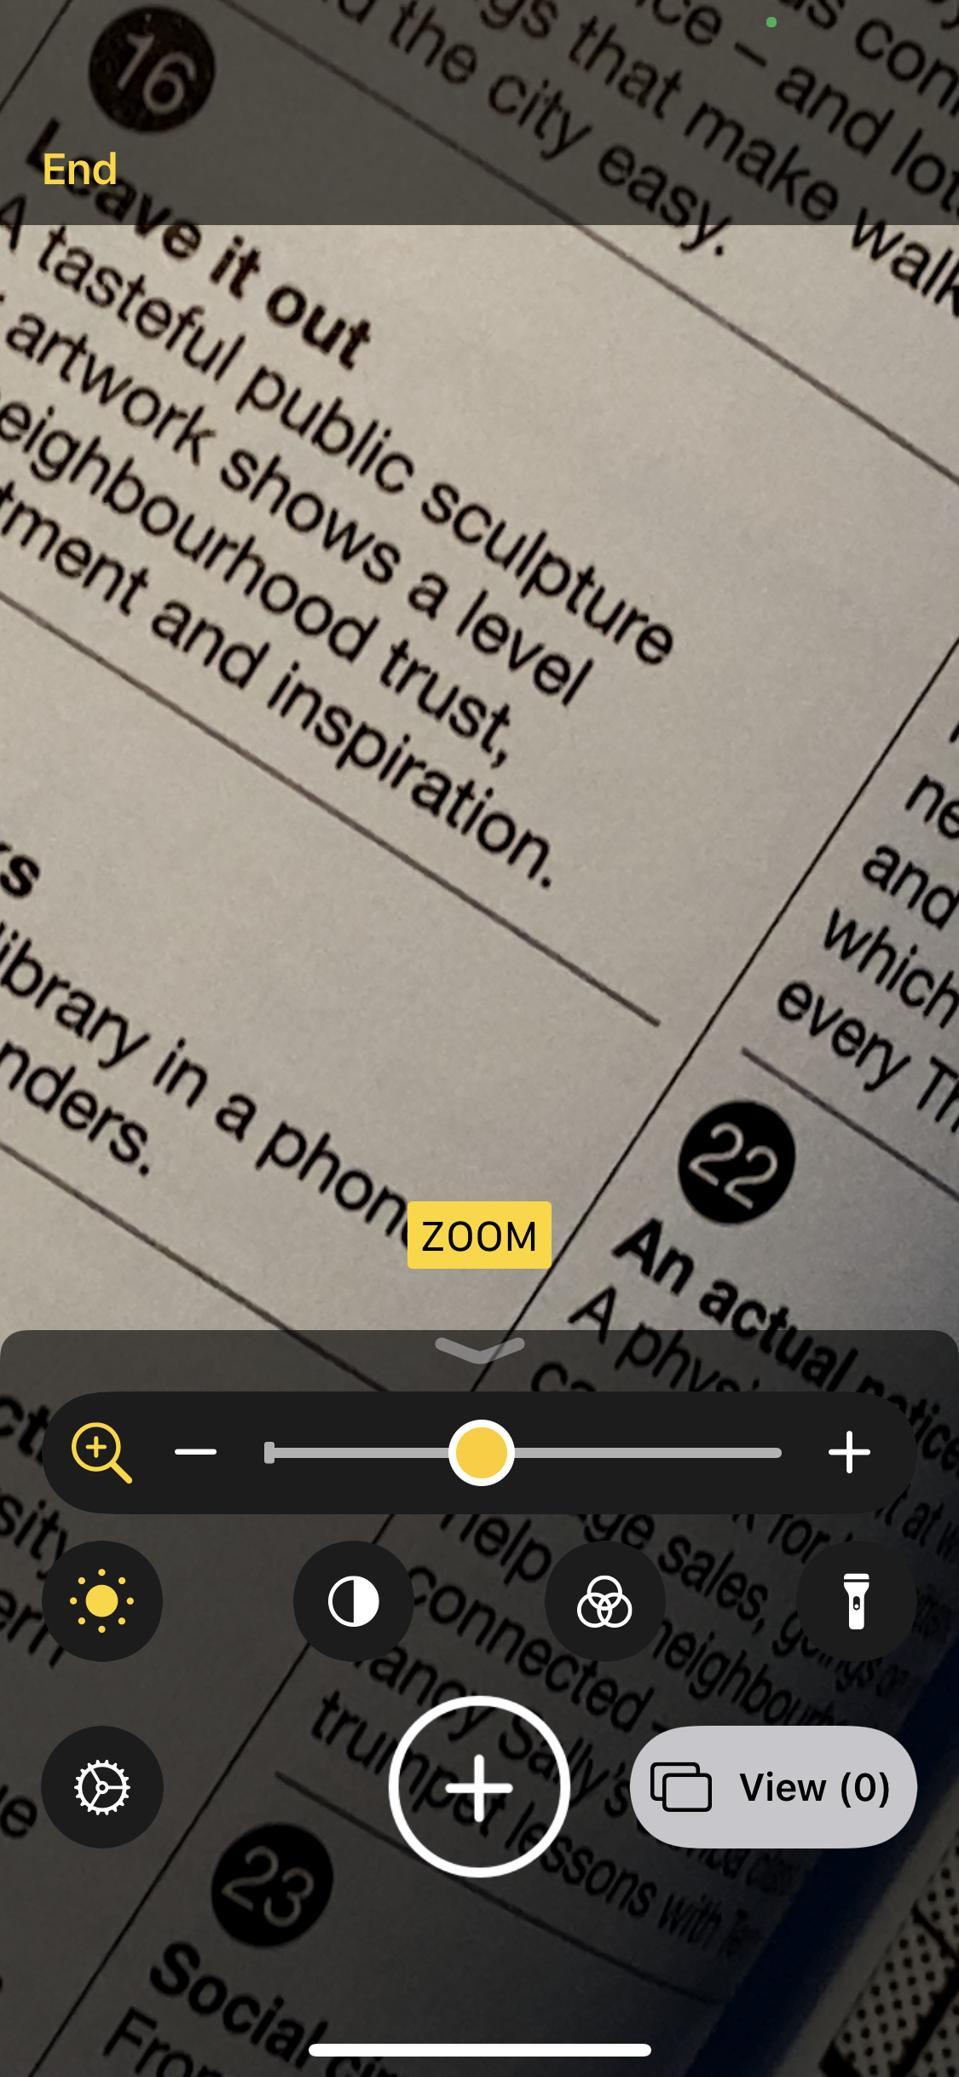 A view through the Magnifier lens in iOS 14.